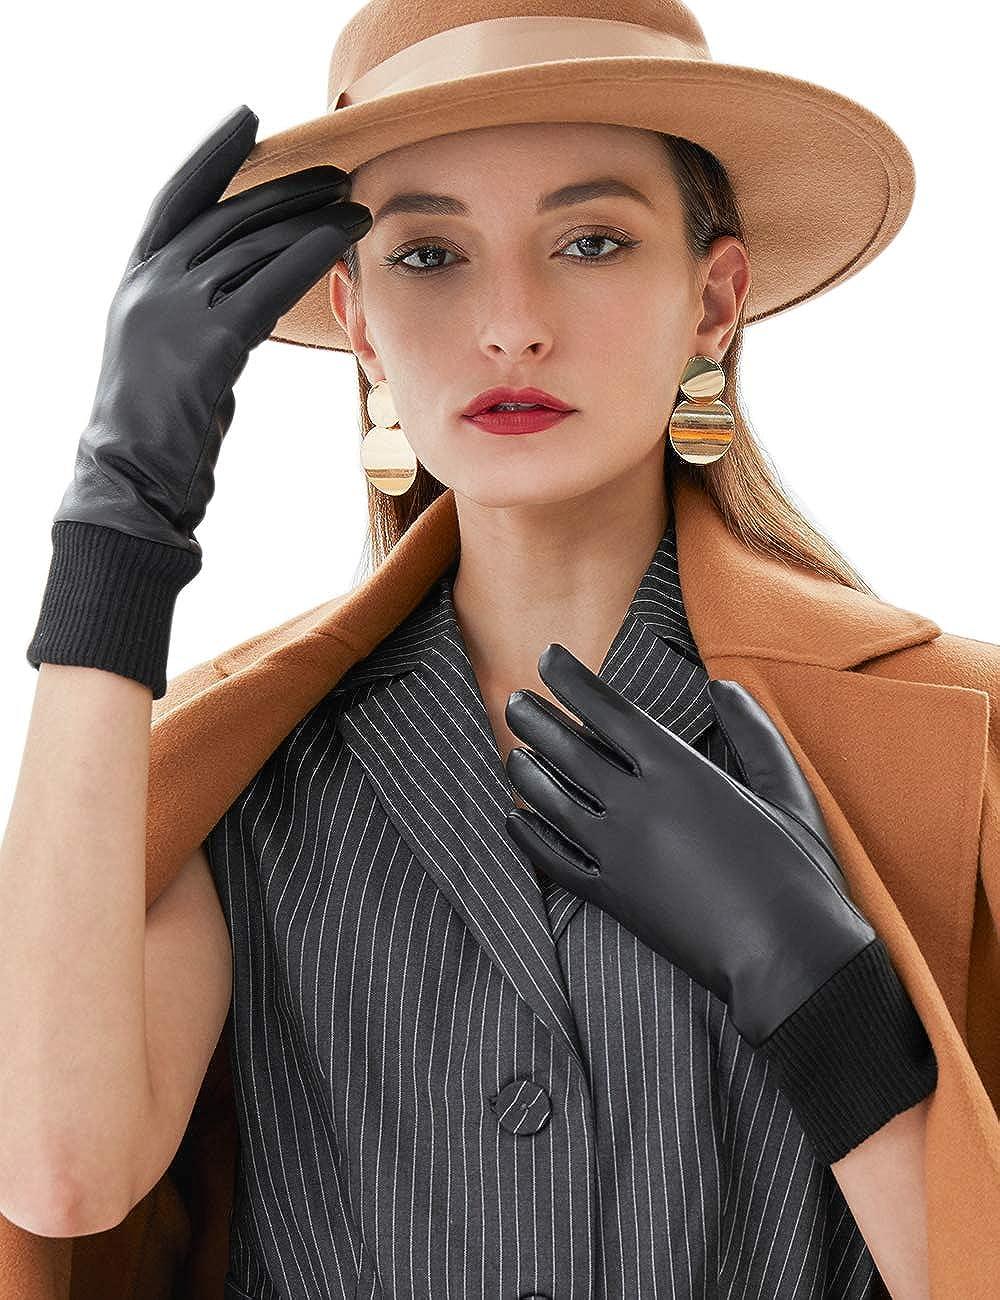 VIKIDEER Warm Winter Genuine Leather Gloves Women Touchscreen Lambskin Driving Riding Gloves